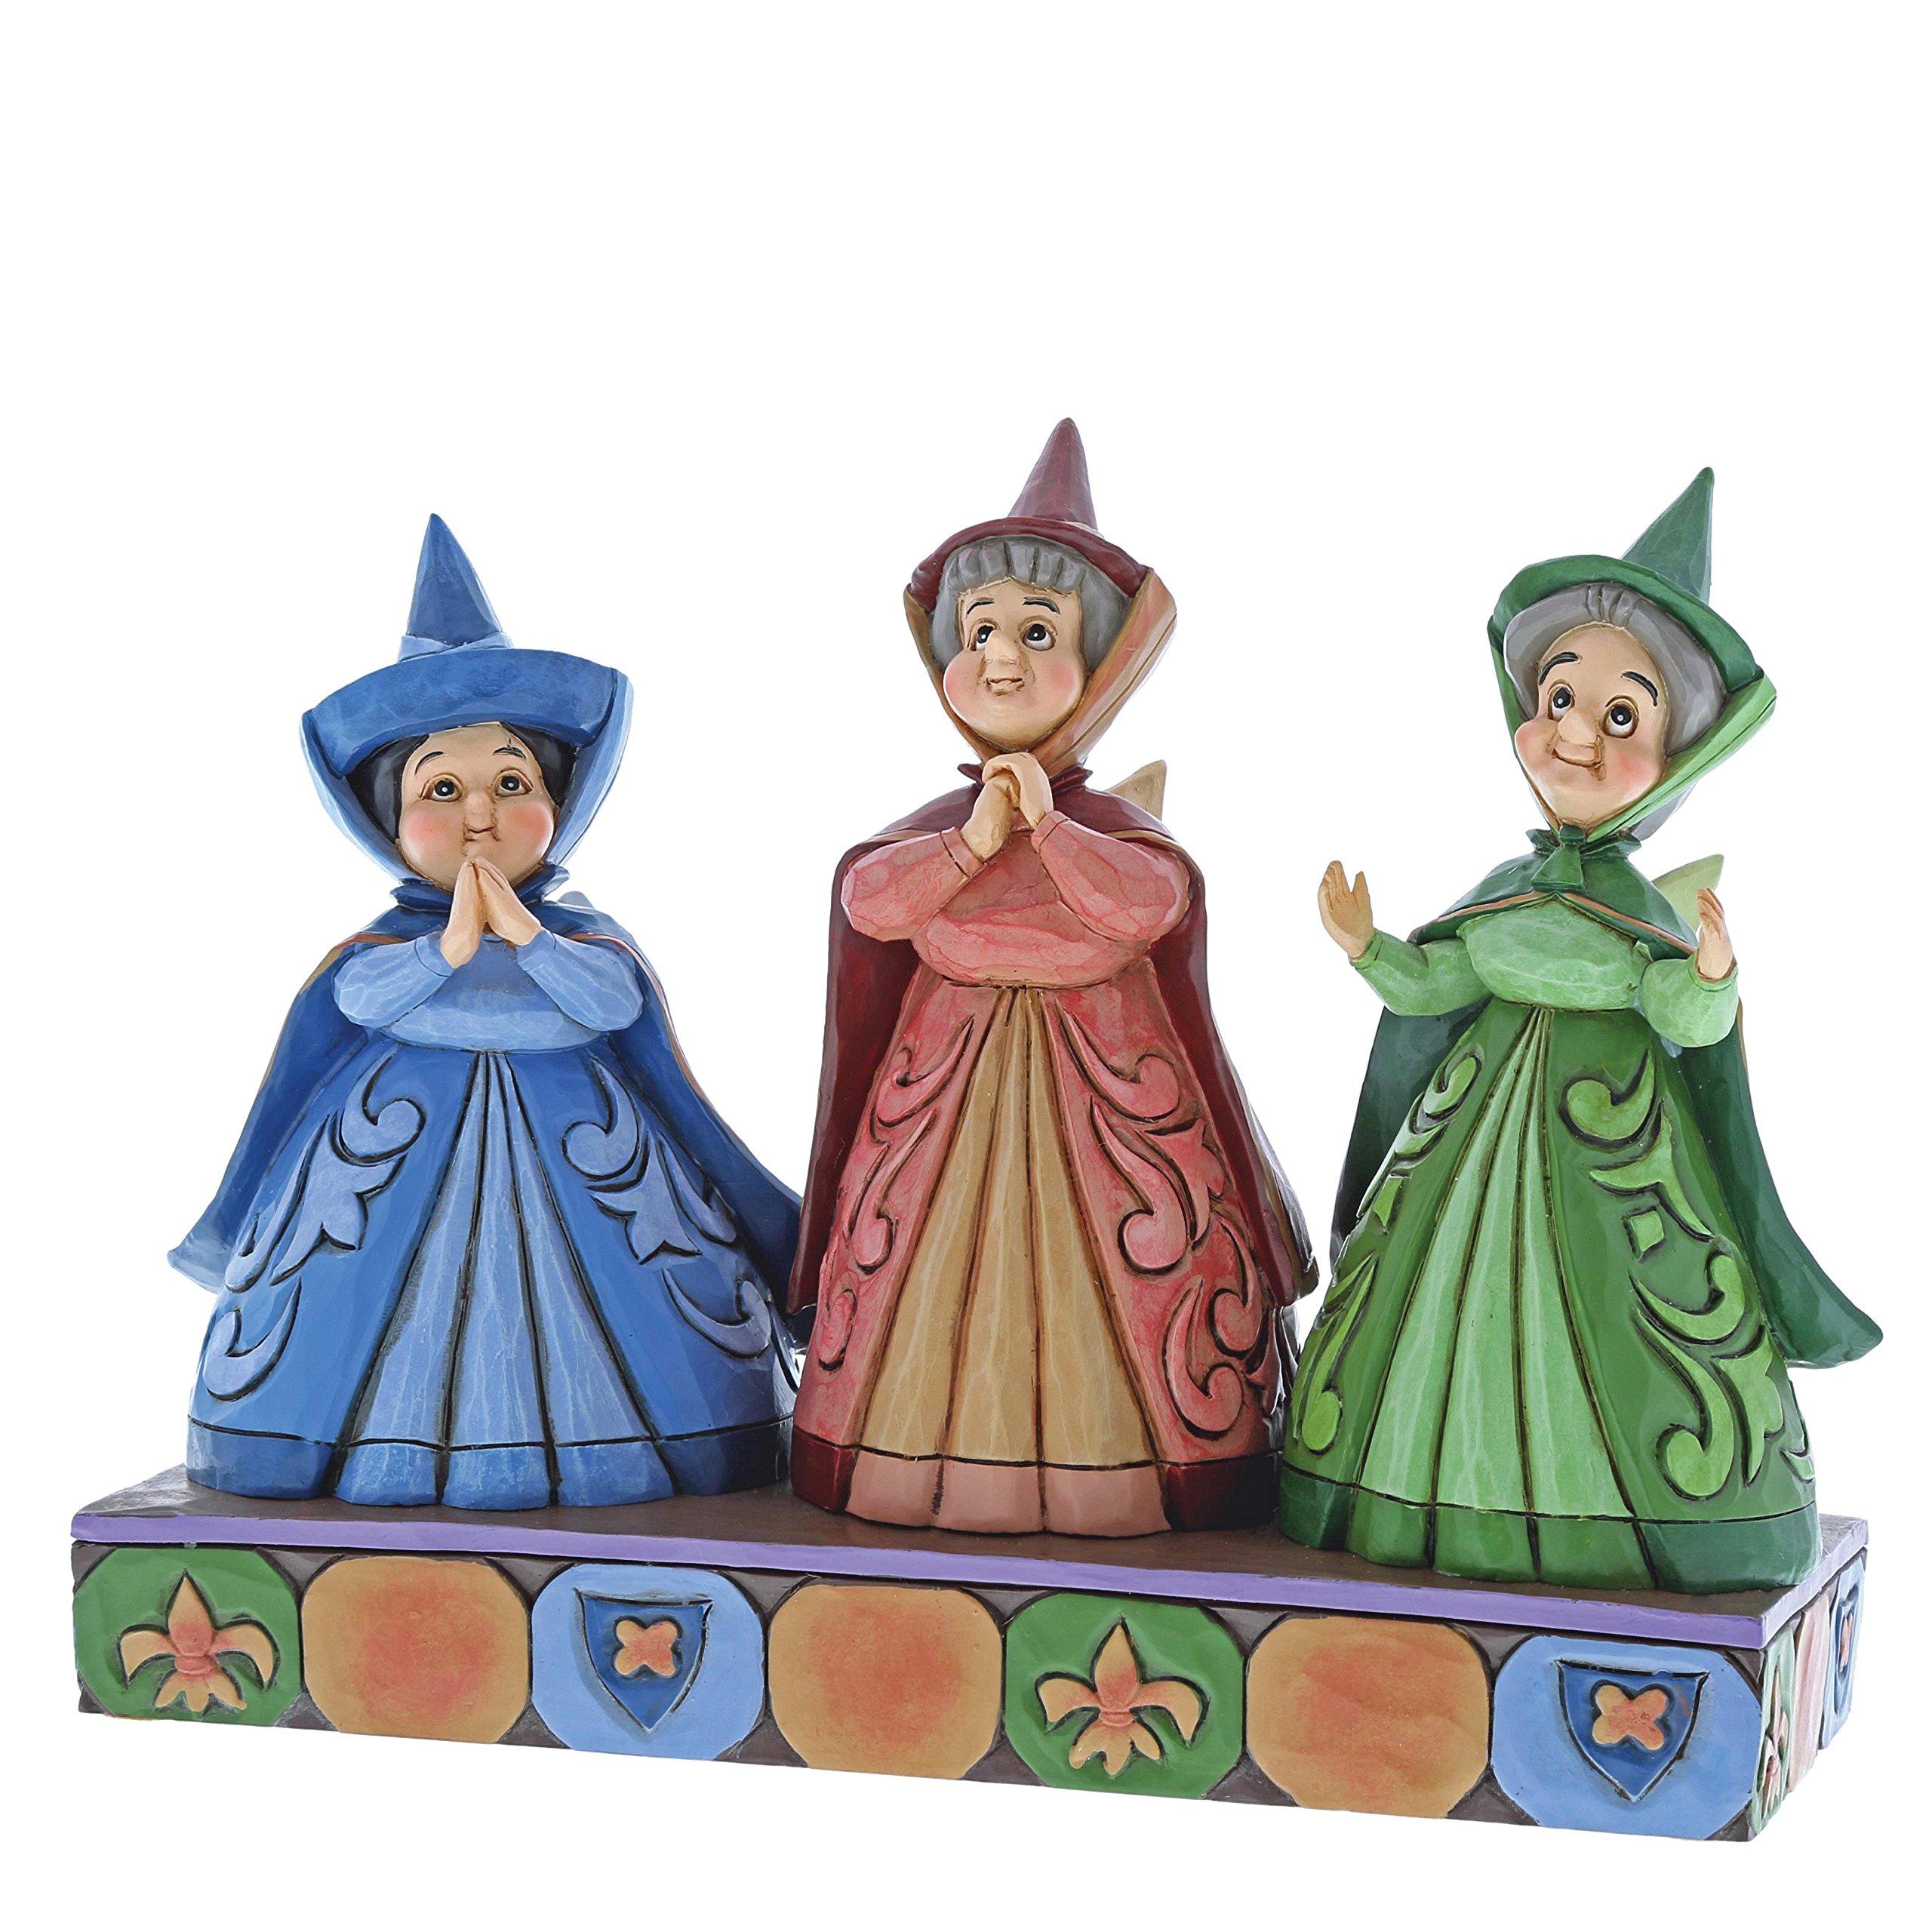 Disney Traditions 4059734 Royal Guests Three Fairies Figurine, Resin, Multi-Colour, 6 x 15 x 7 cm